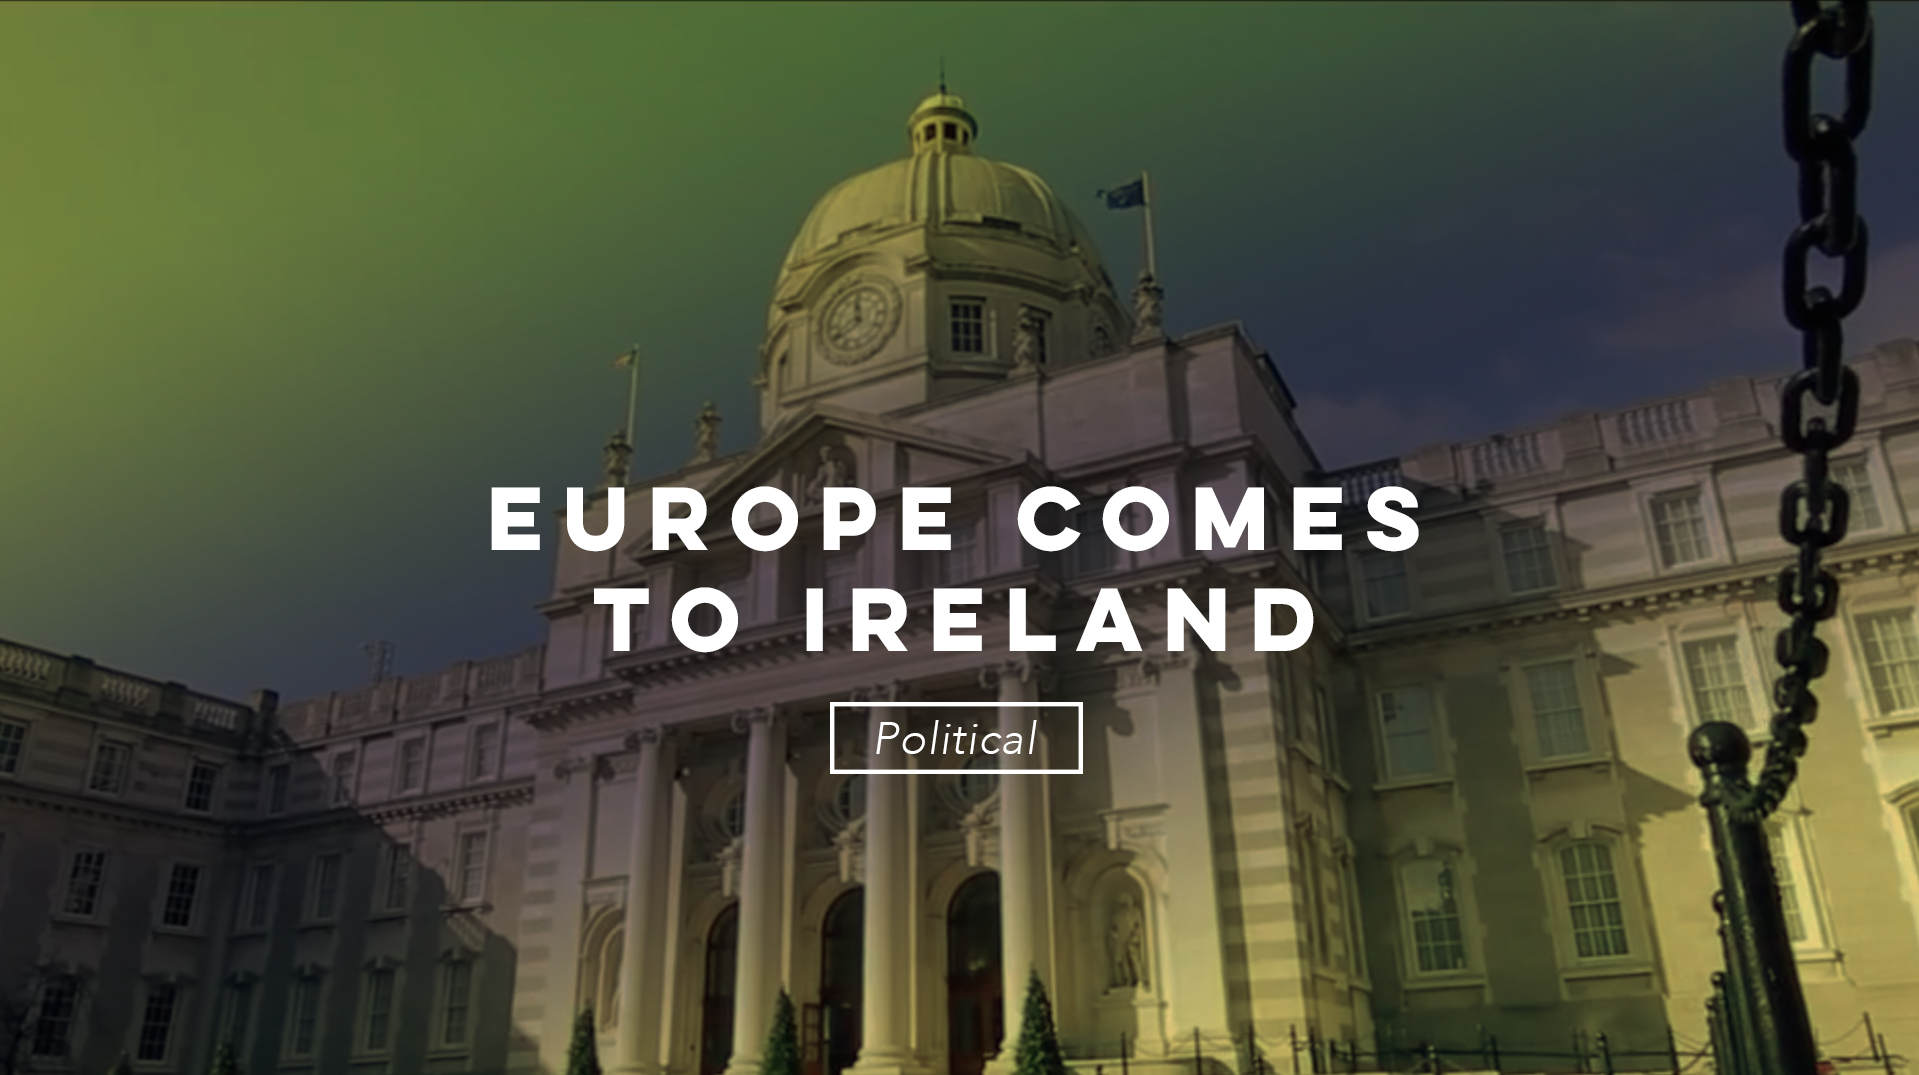 Europe Comes to Ireland